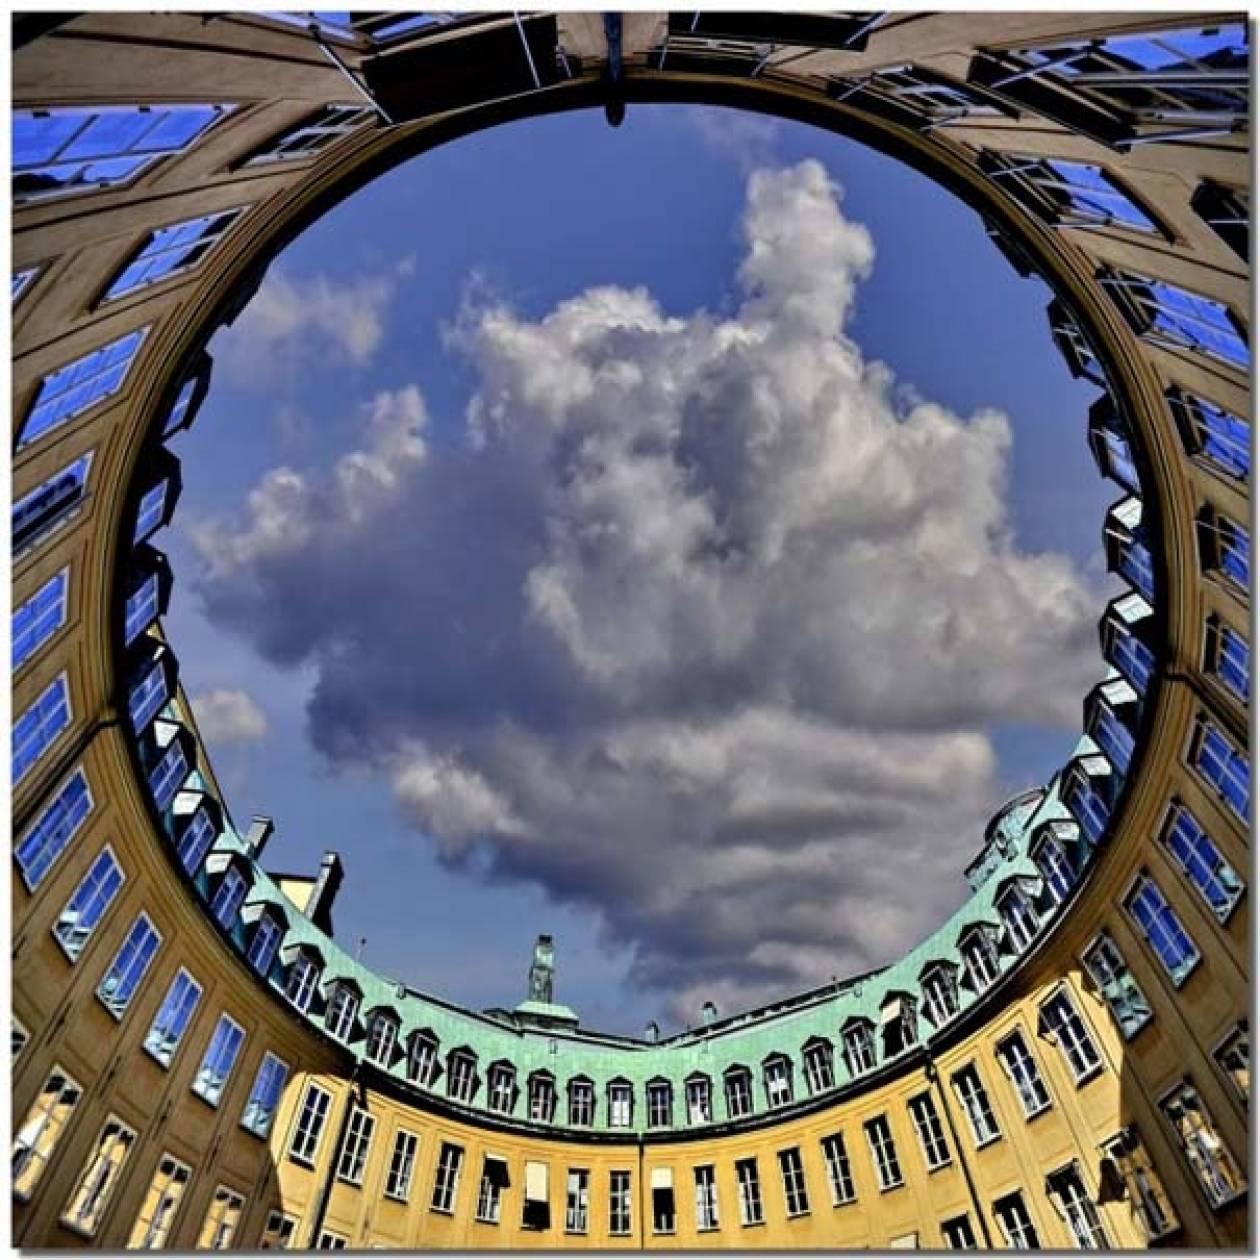 Eντυπωσιακές αρχιτεκτονικές φωτογραφίες που προκαλούν ίλιγγο